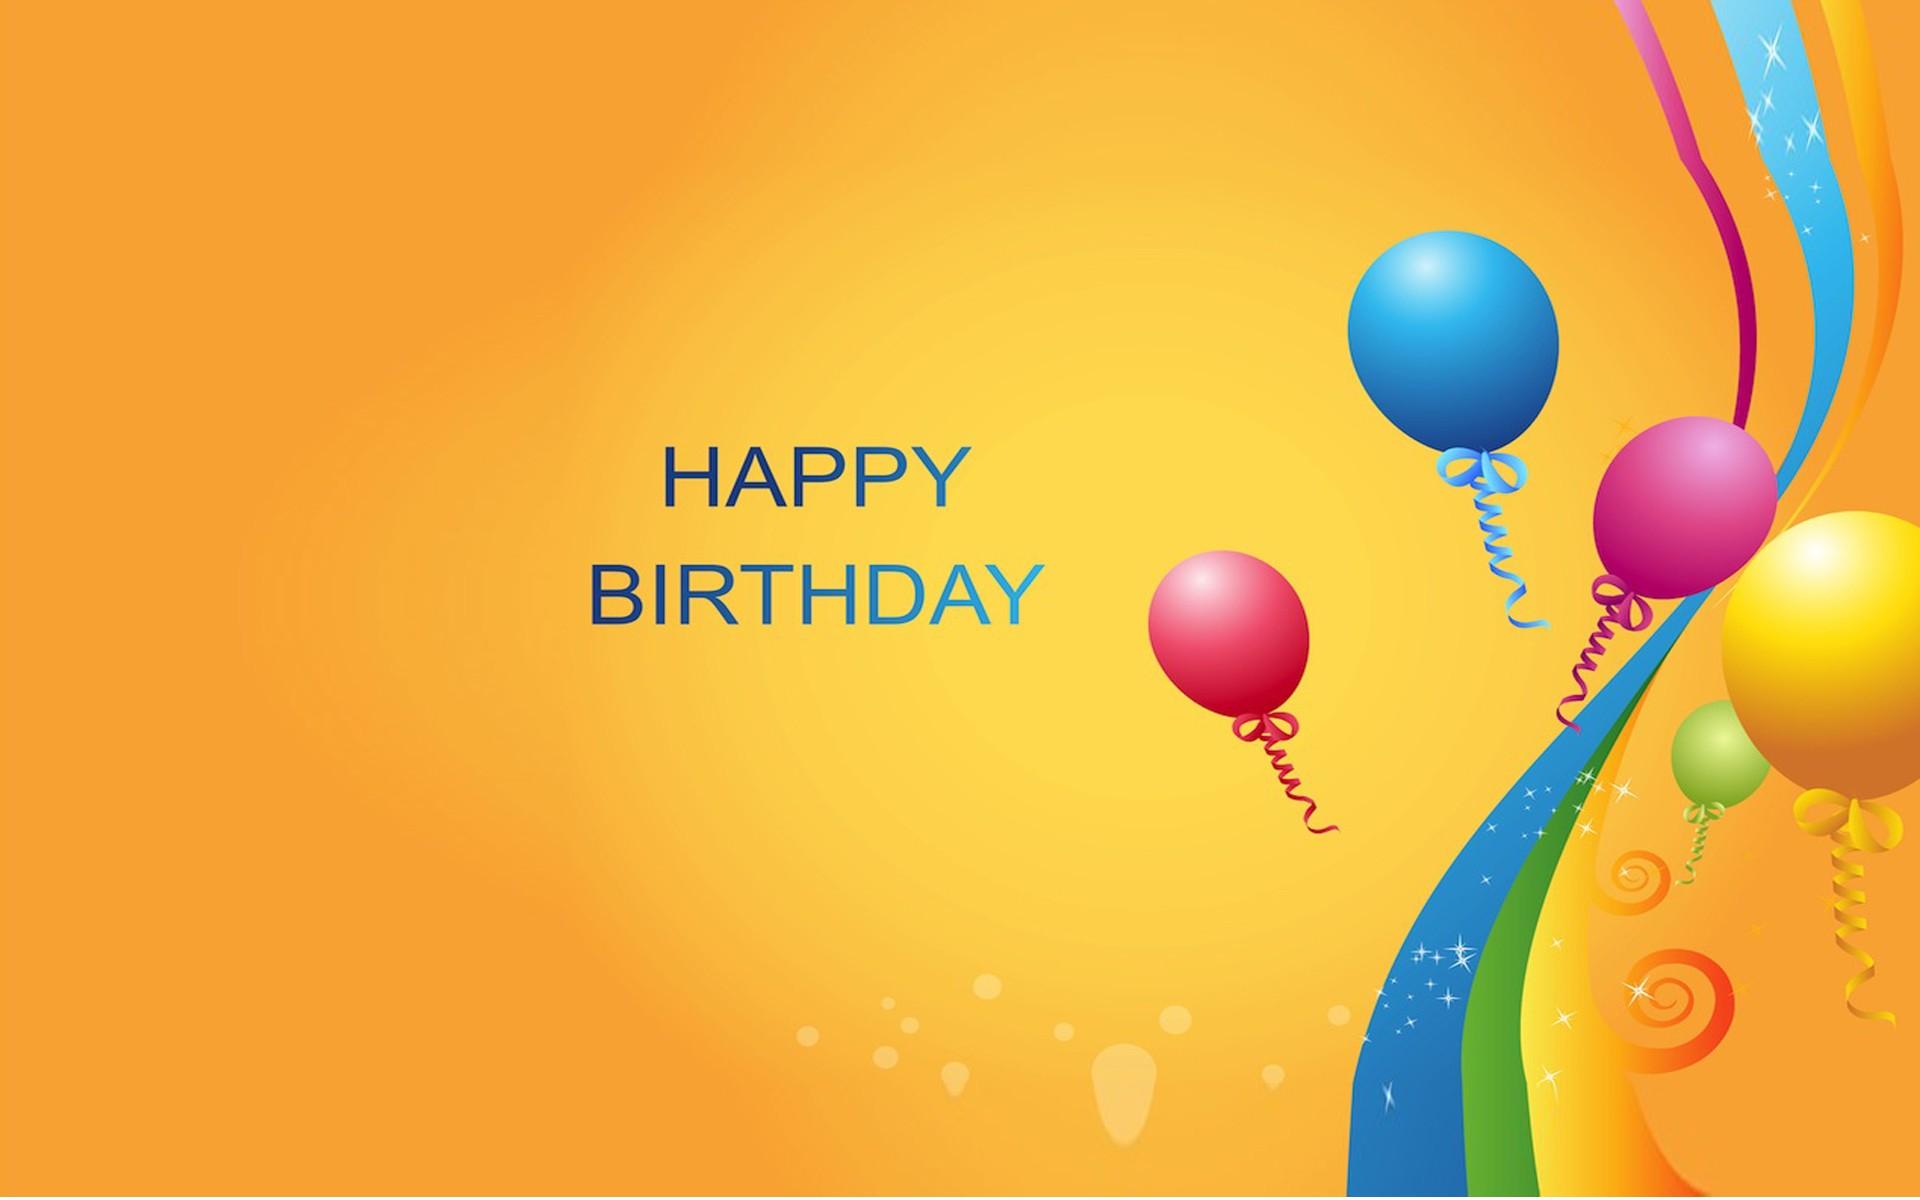 Happy Birthday Wallpaper HD 1920x1200